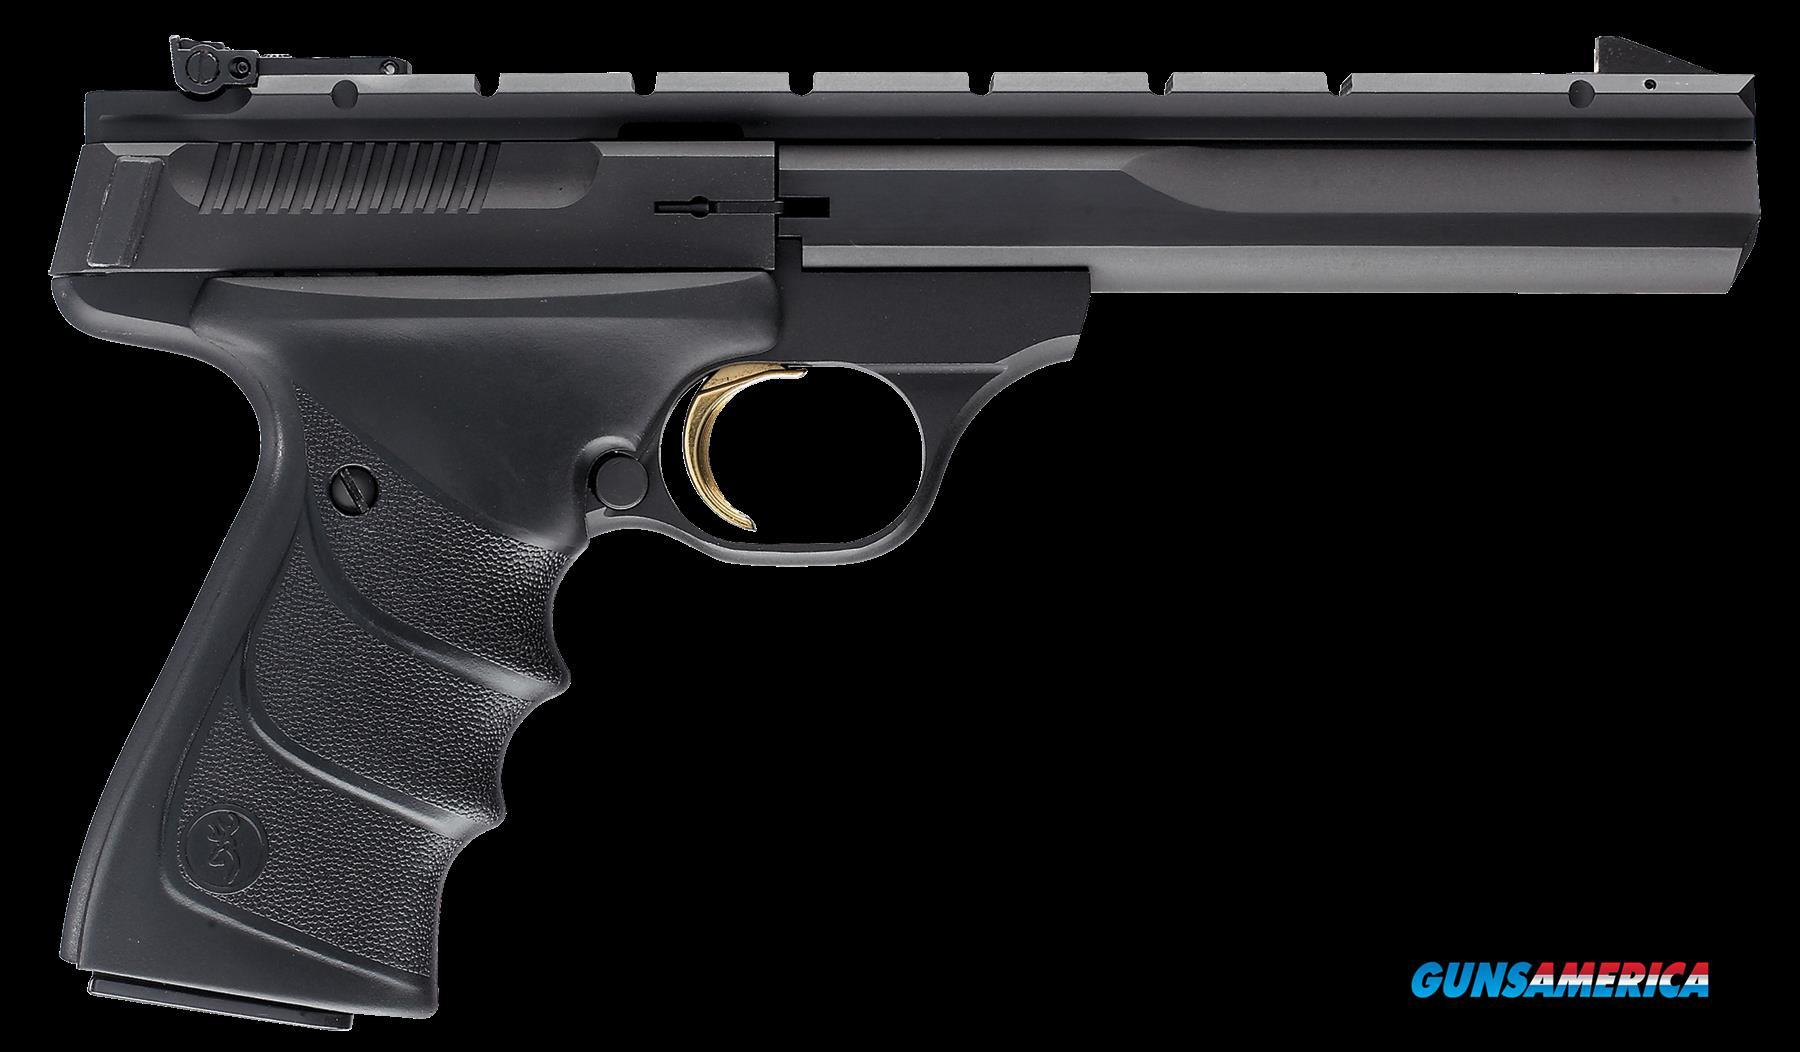 Browning Buck Mark, Brn 051-421490 Bkmk 22 Cnt Urx *ca* Mt  Guns > Pistols > 1911 Pistol Copies (non-Colt)